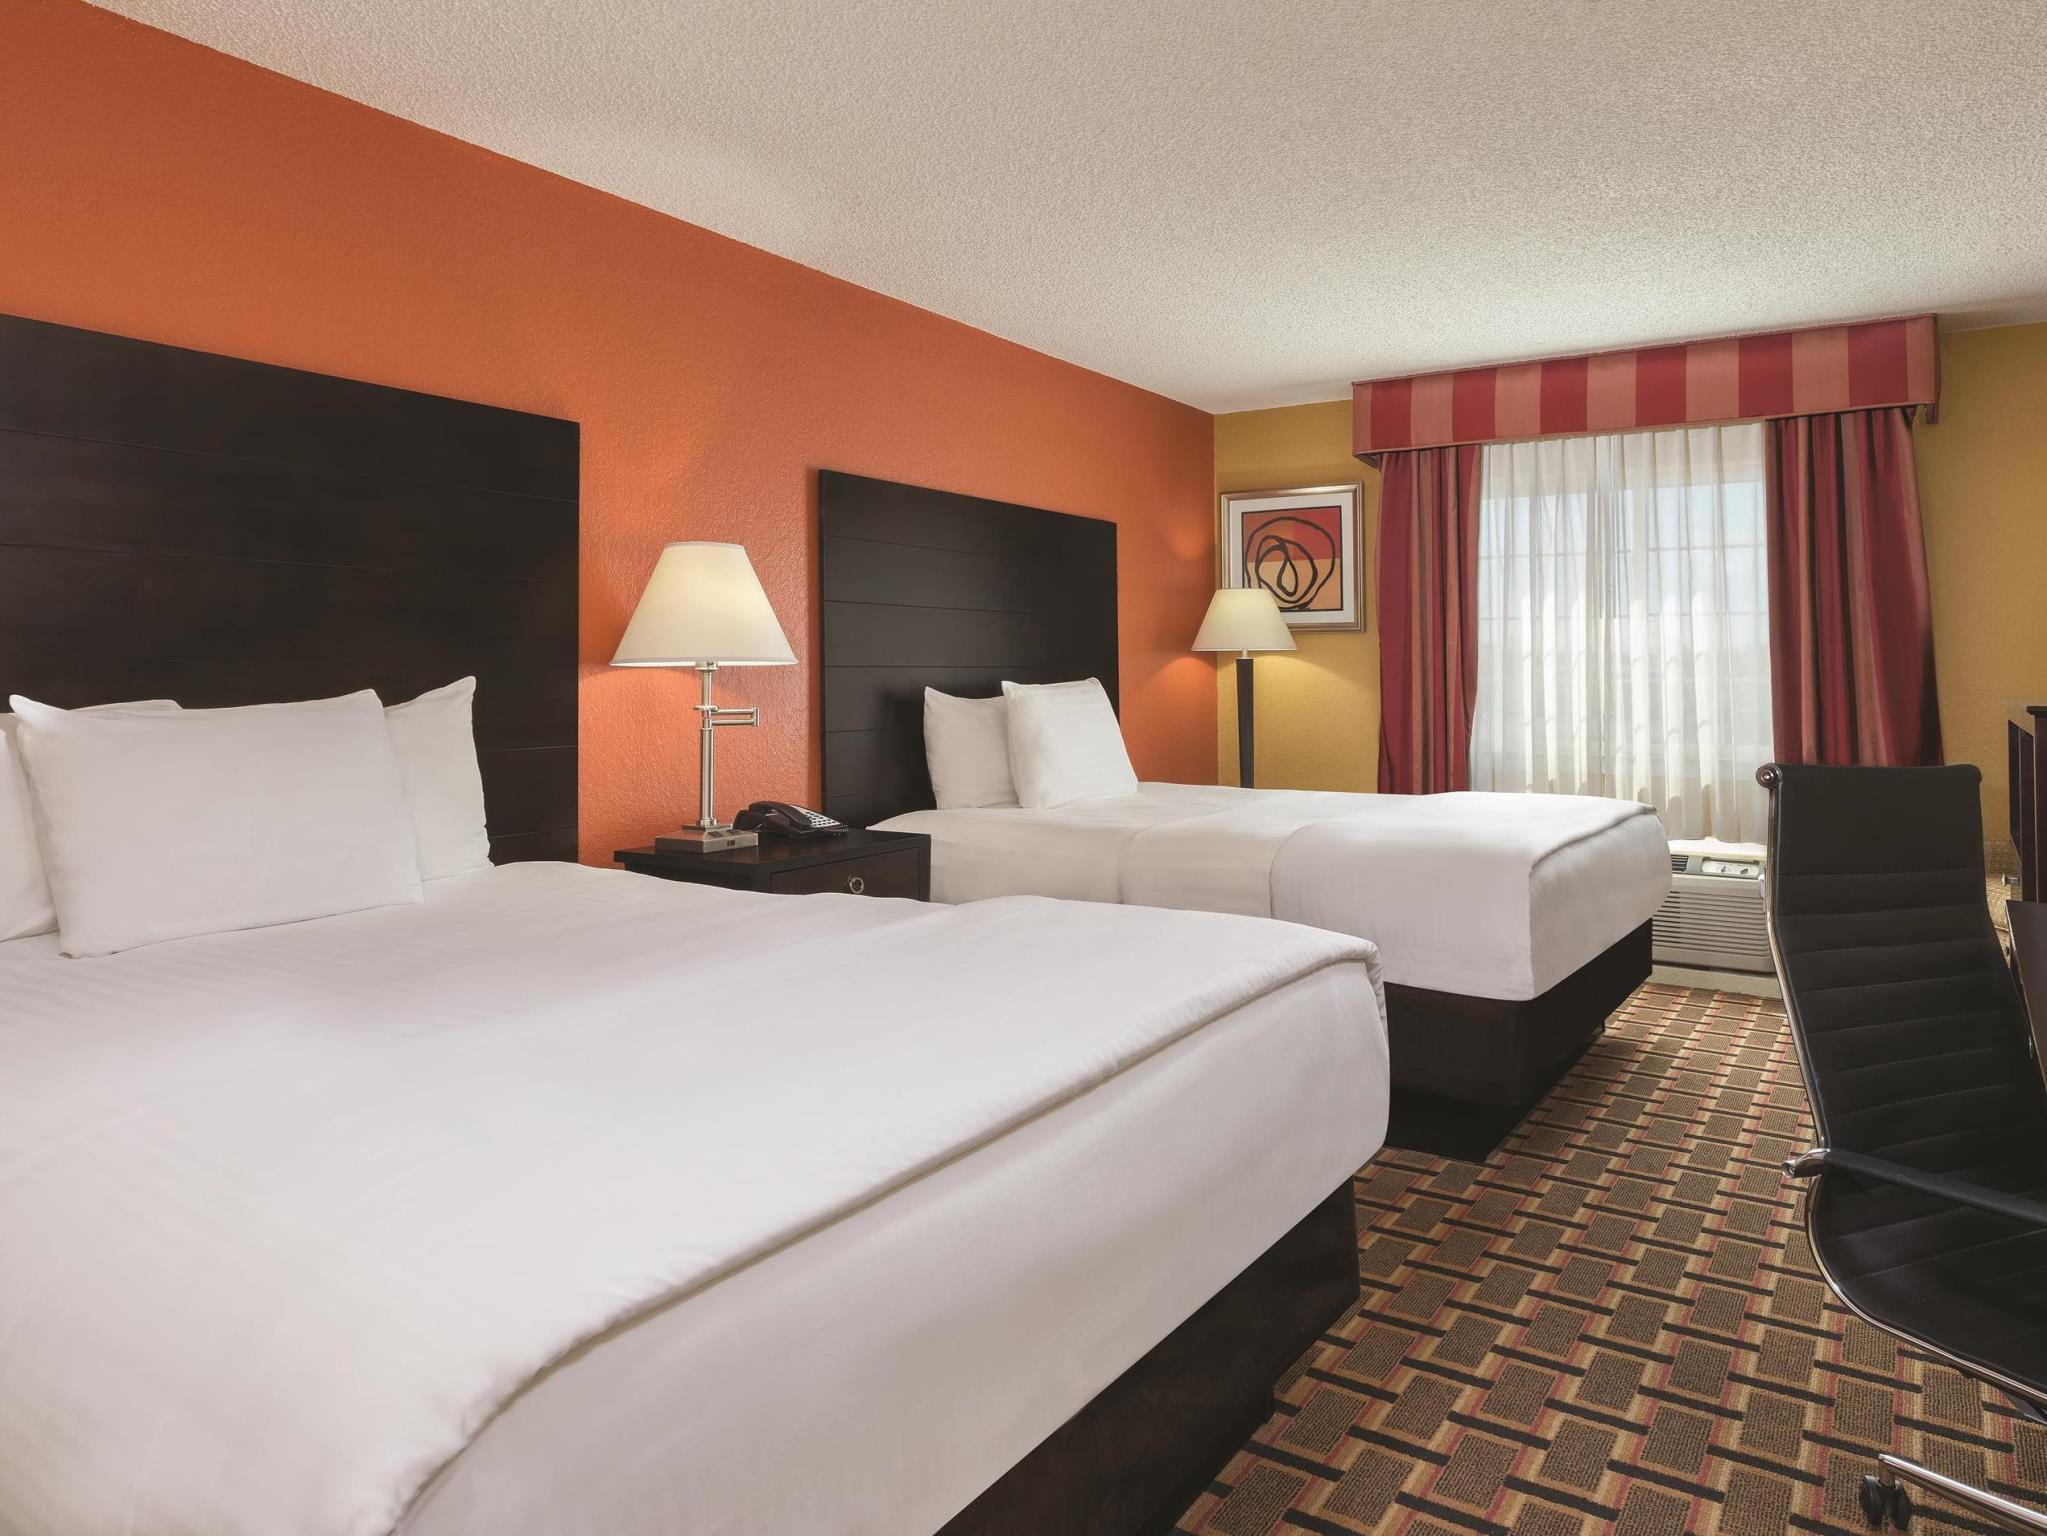 La Quinta Inn And Suites By Wyndham Joplin